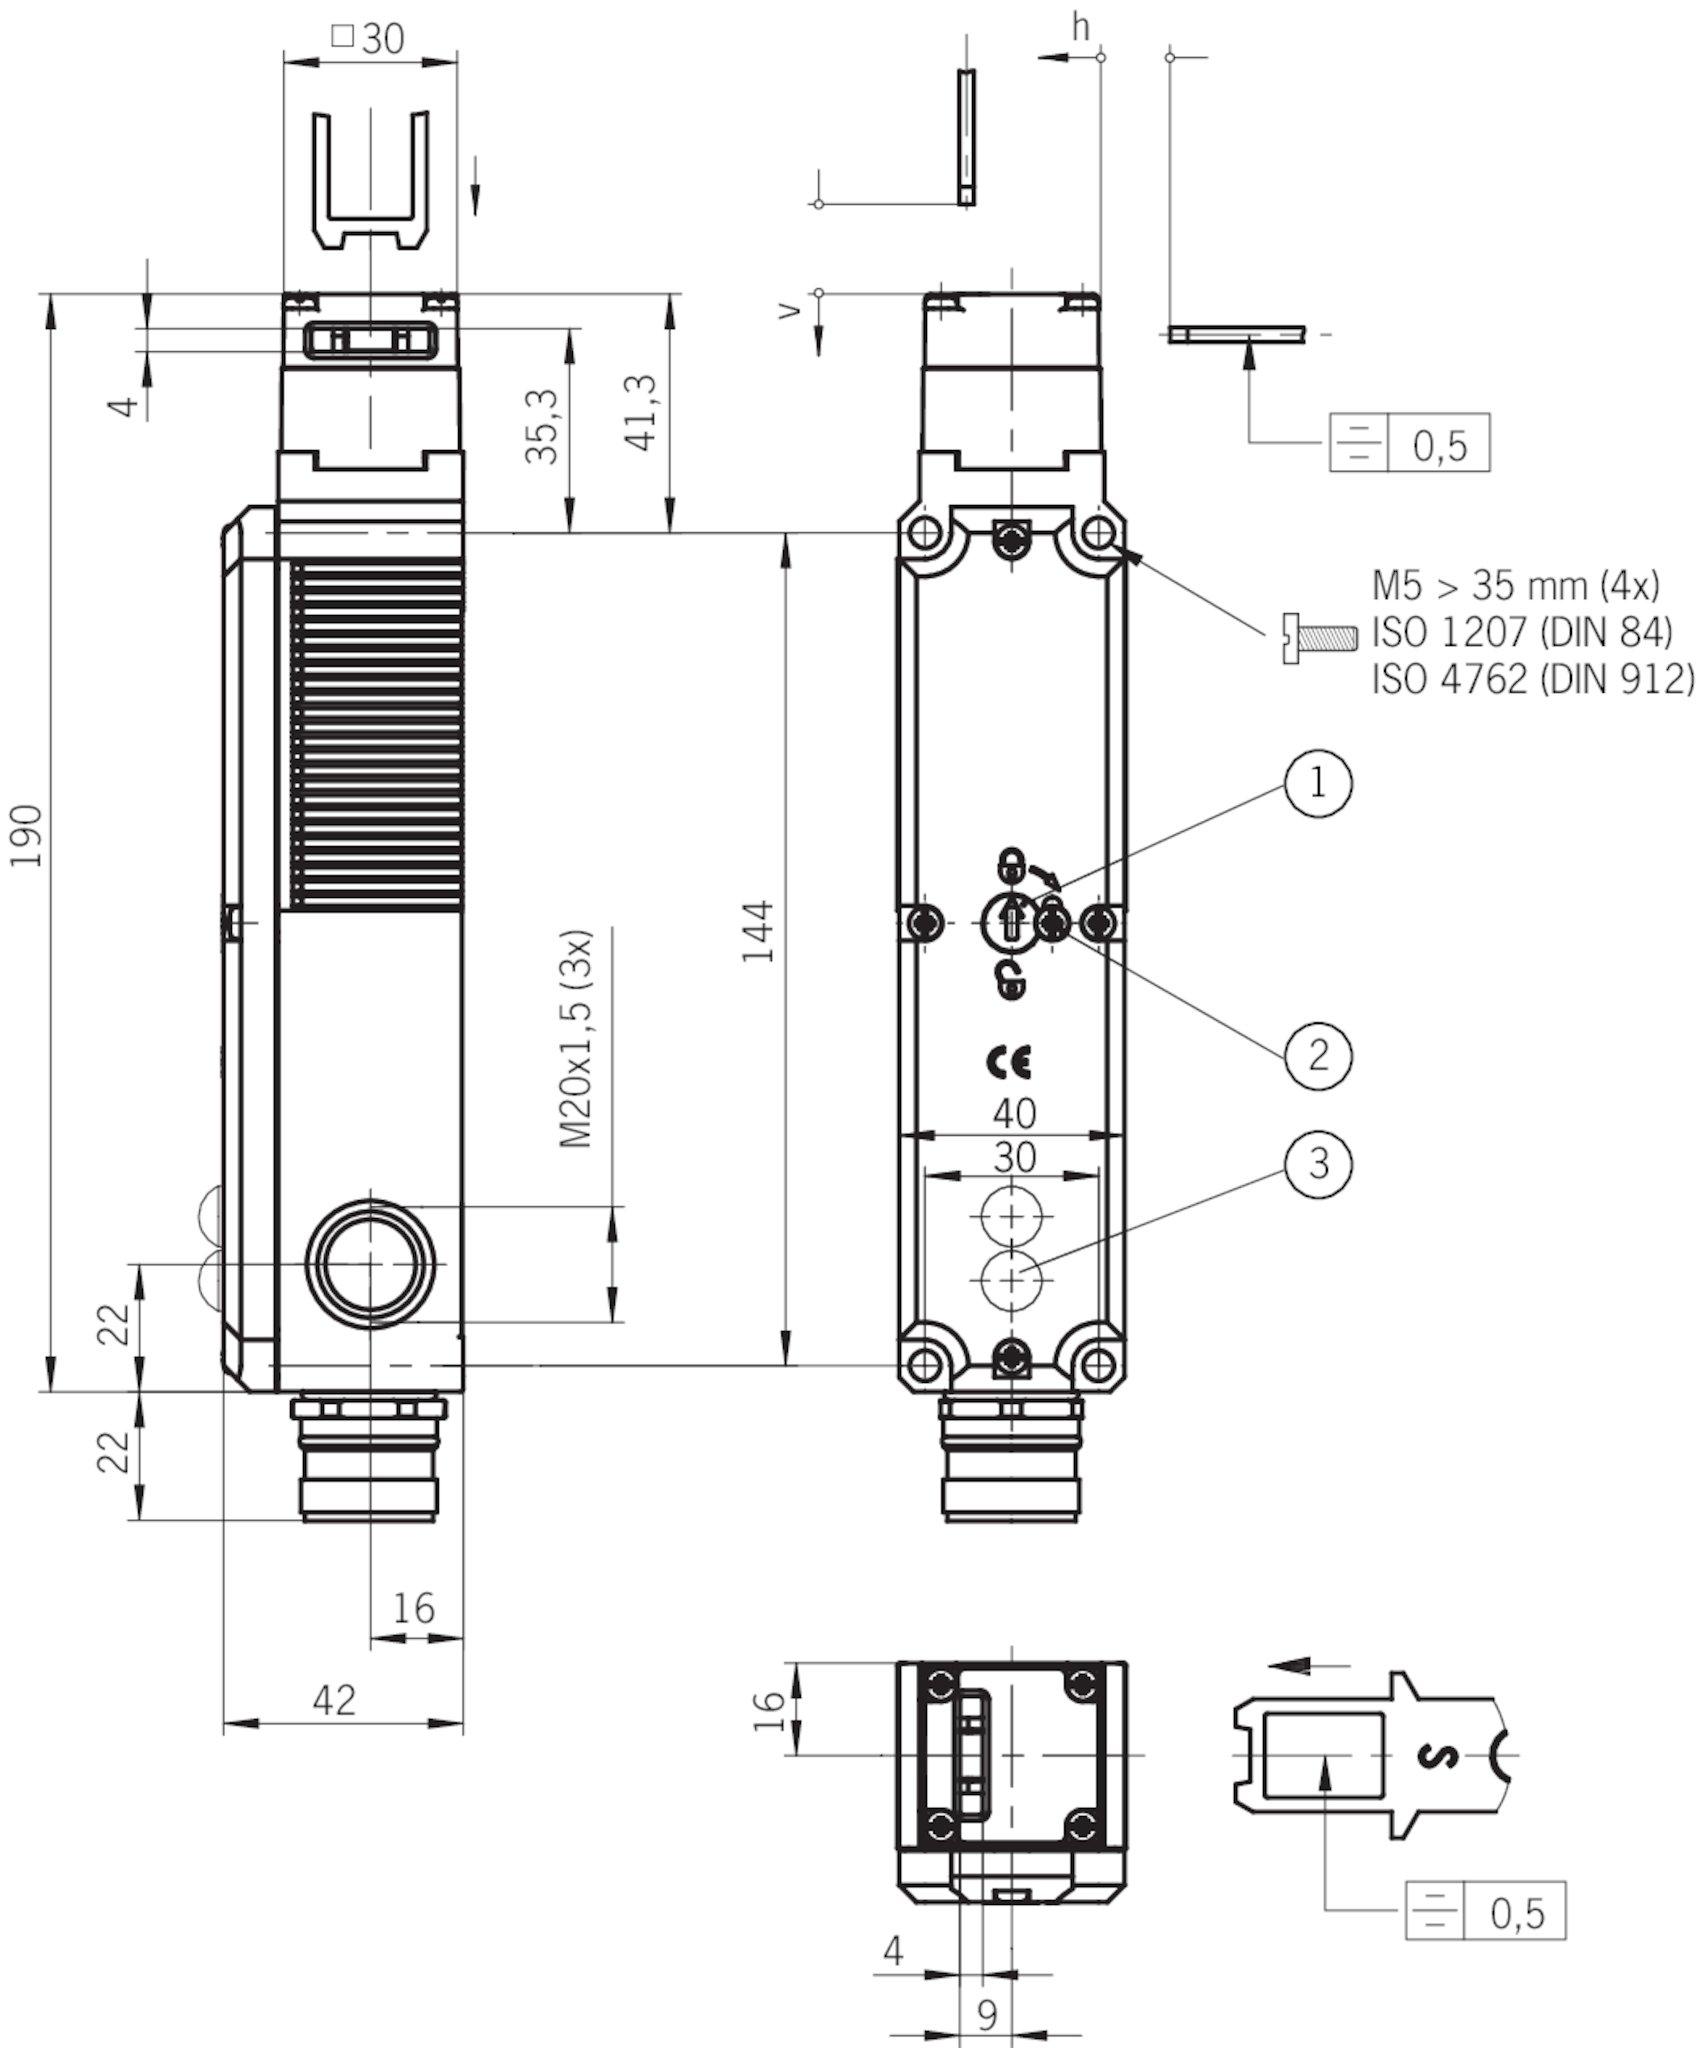 wiring diagram 1971 honda 750 four stp3a-2131a024l024rc18   euchner – more than safety. stp3 wiring diagram